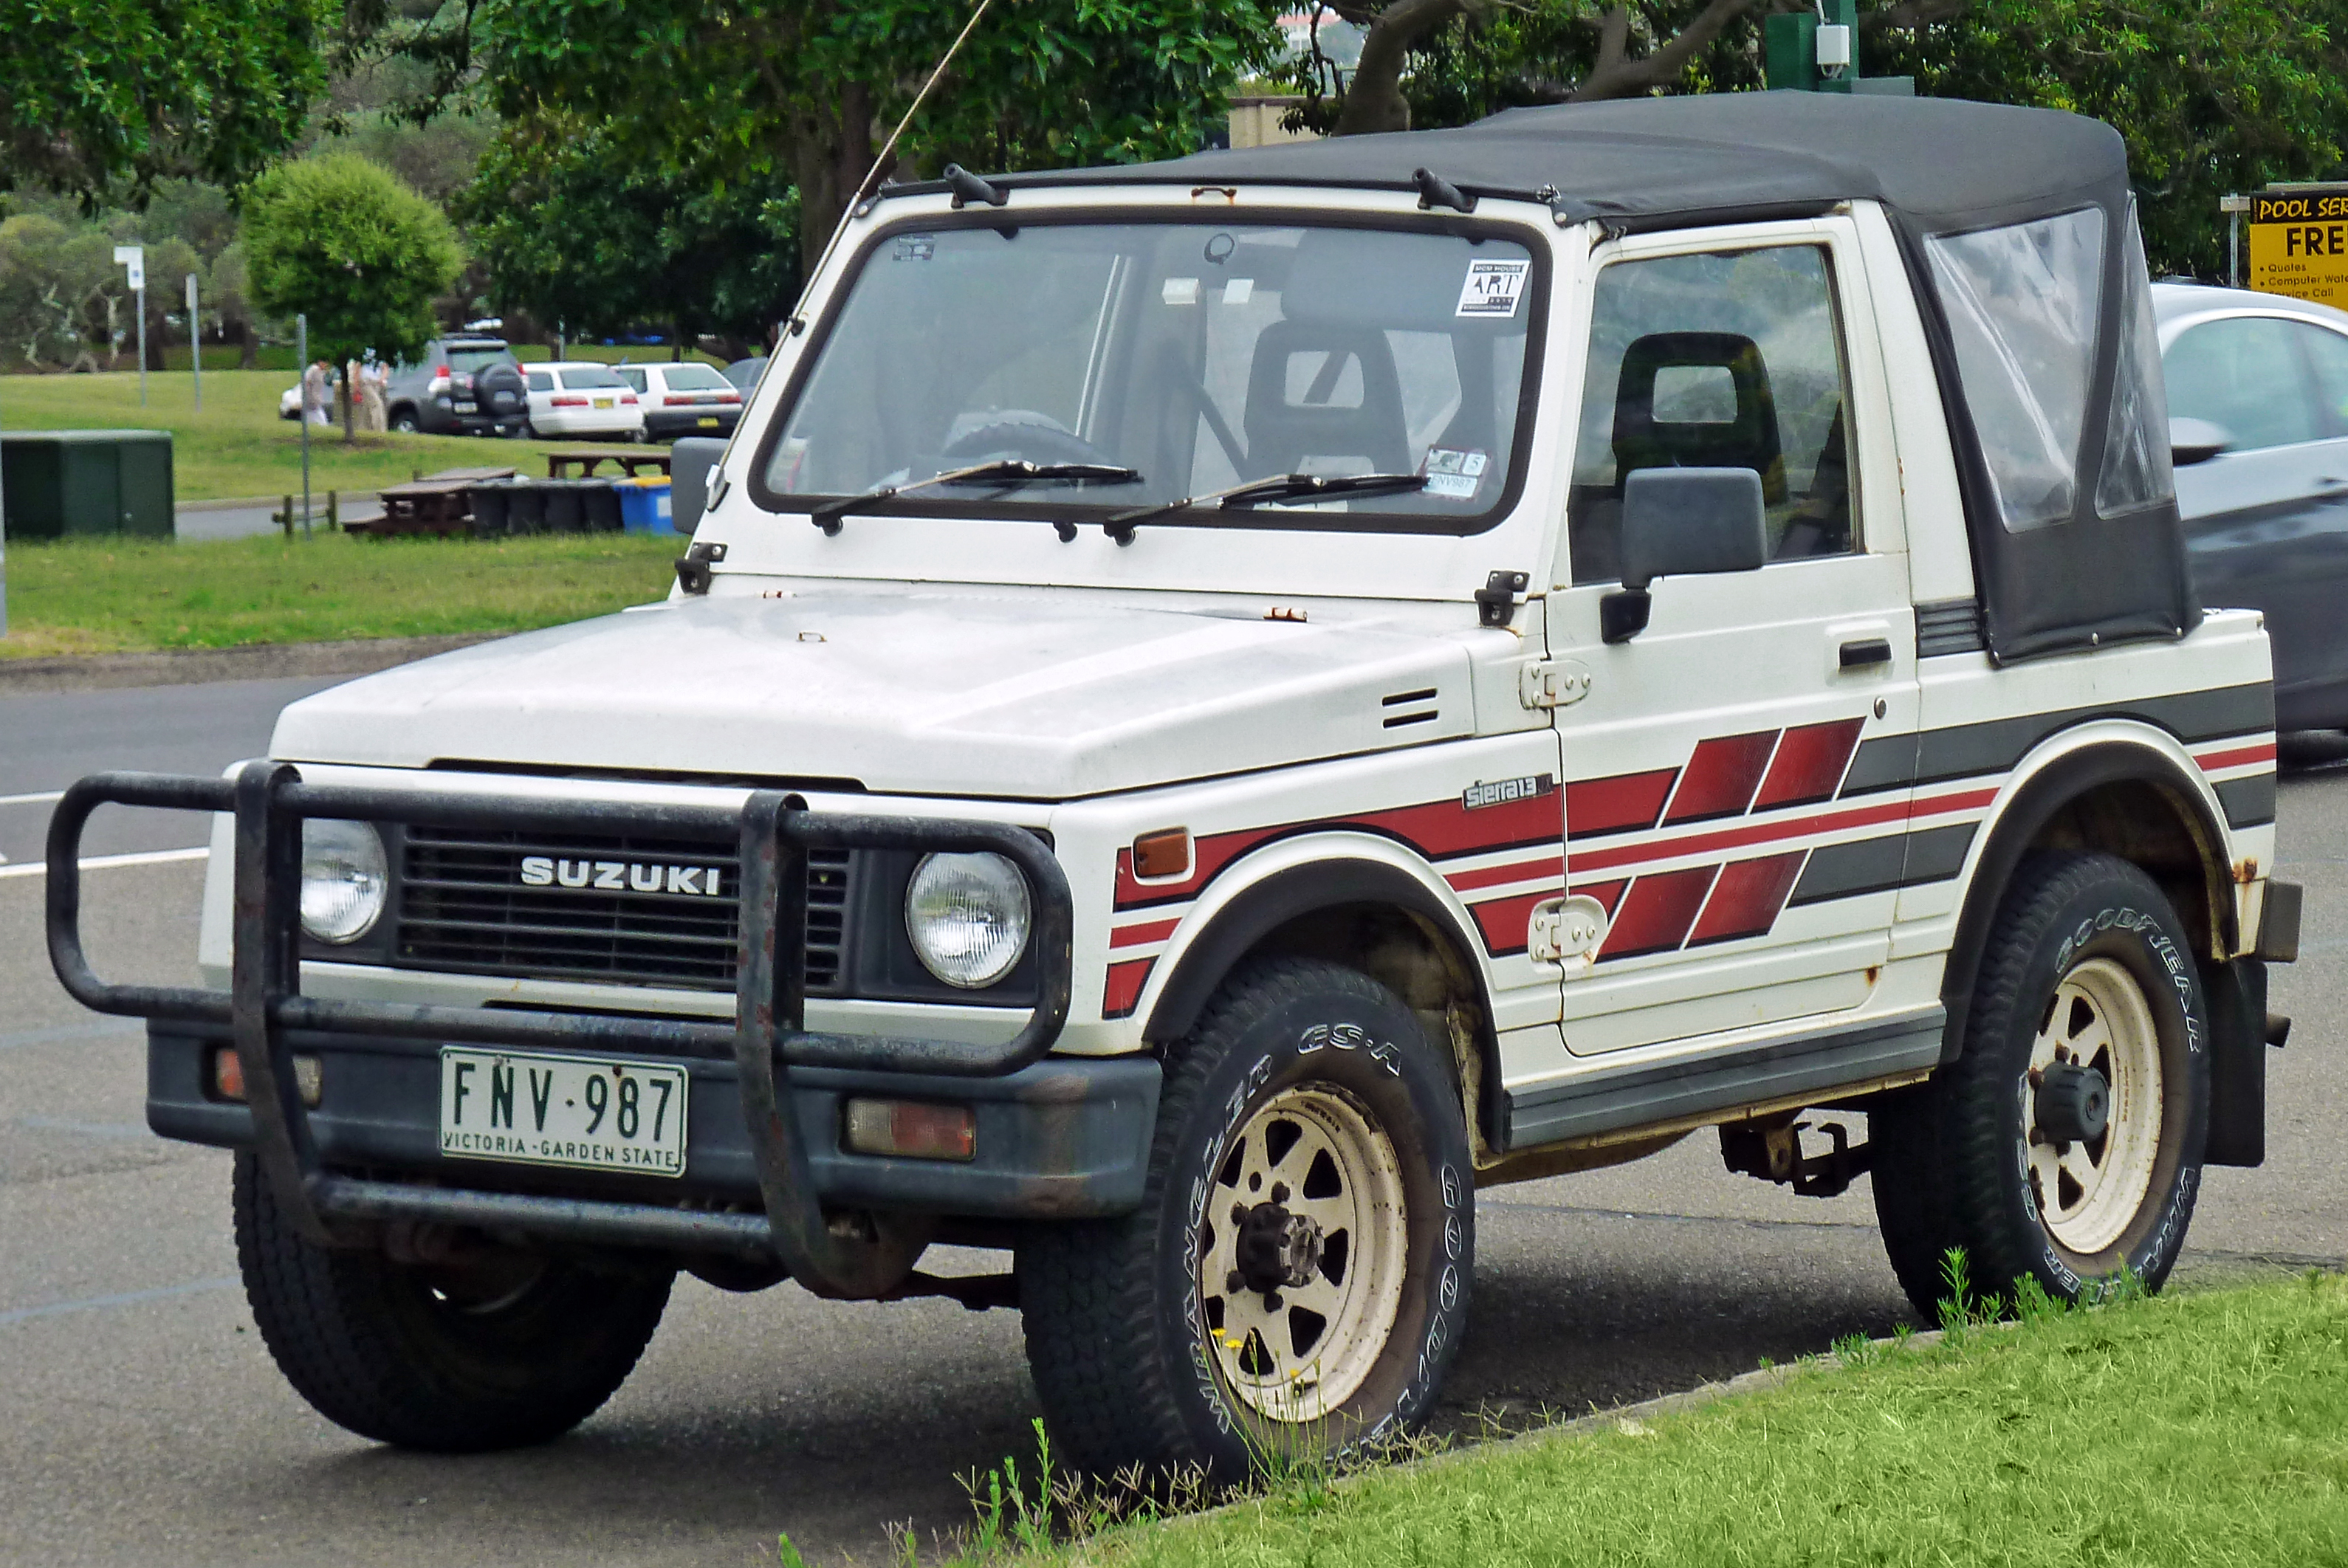 Suzuki Jeep